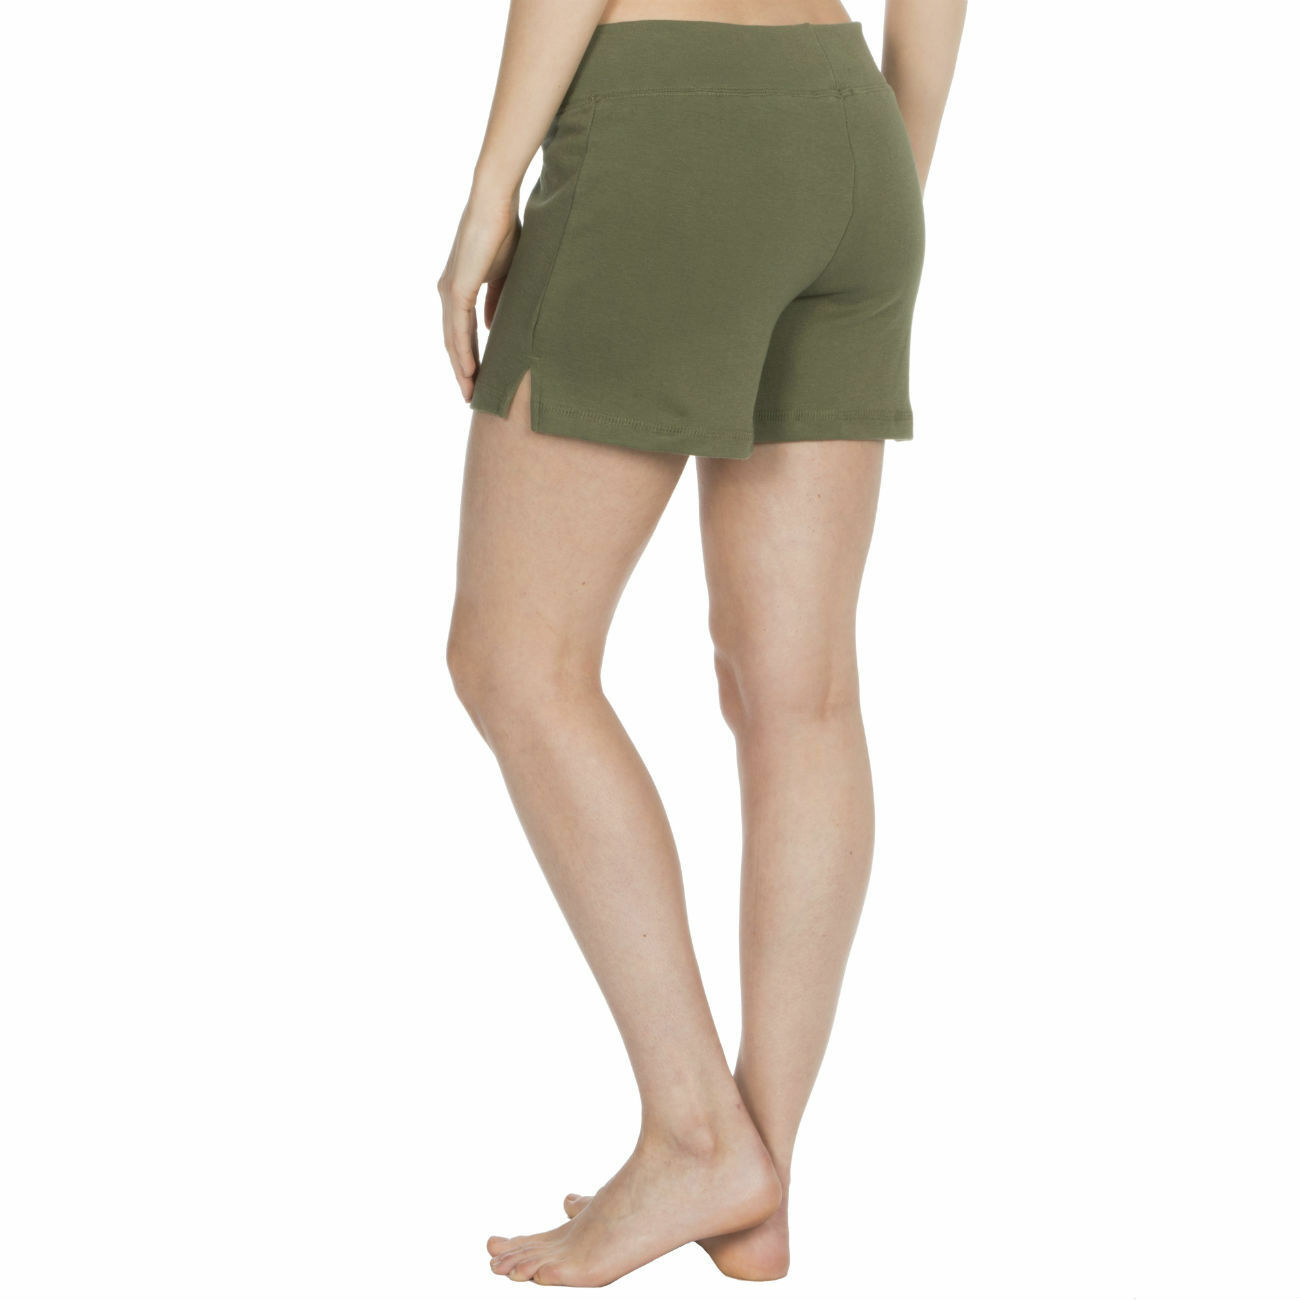 Womens-Cotton-Jersey-Shorts-Elastic-Waist-Summer-Beach-Casual-Yoga-Hot-Pants-New thumbnail 22